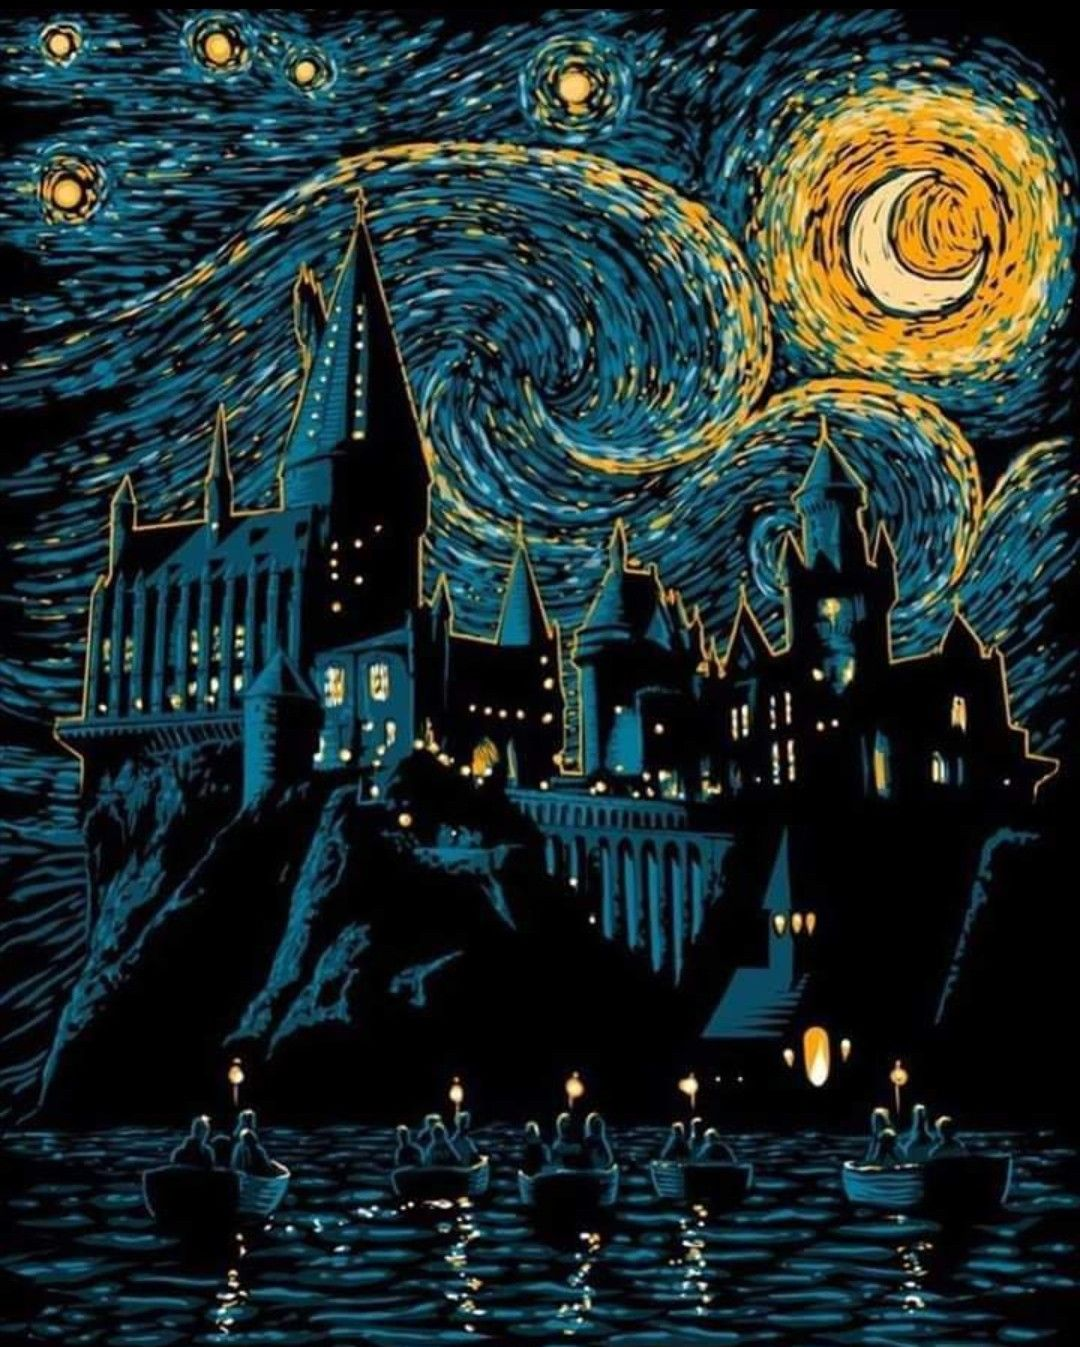 Harry Potter Starry Night Wallpaper